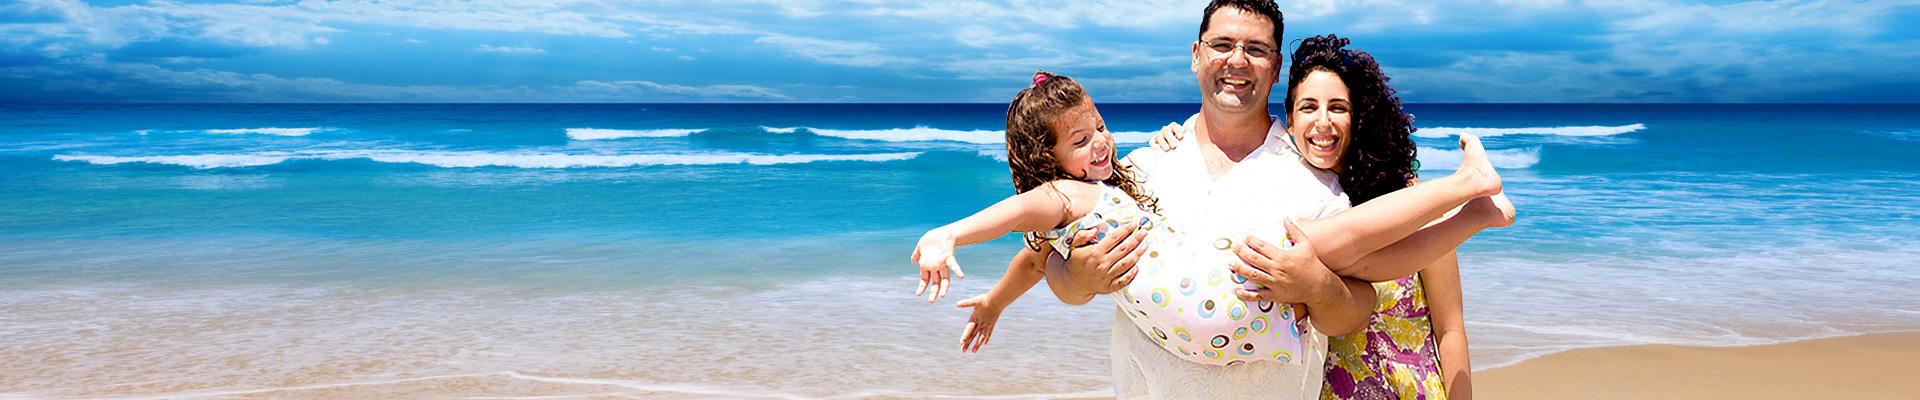 Fin-Beach-Family